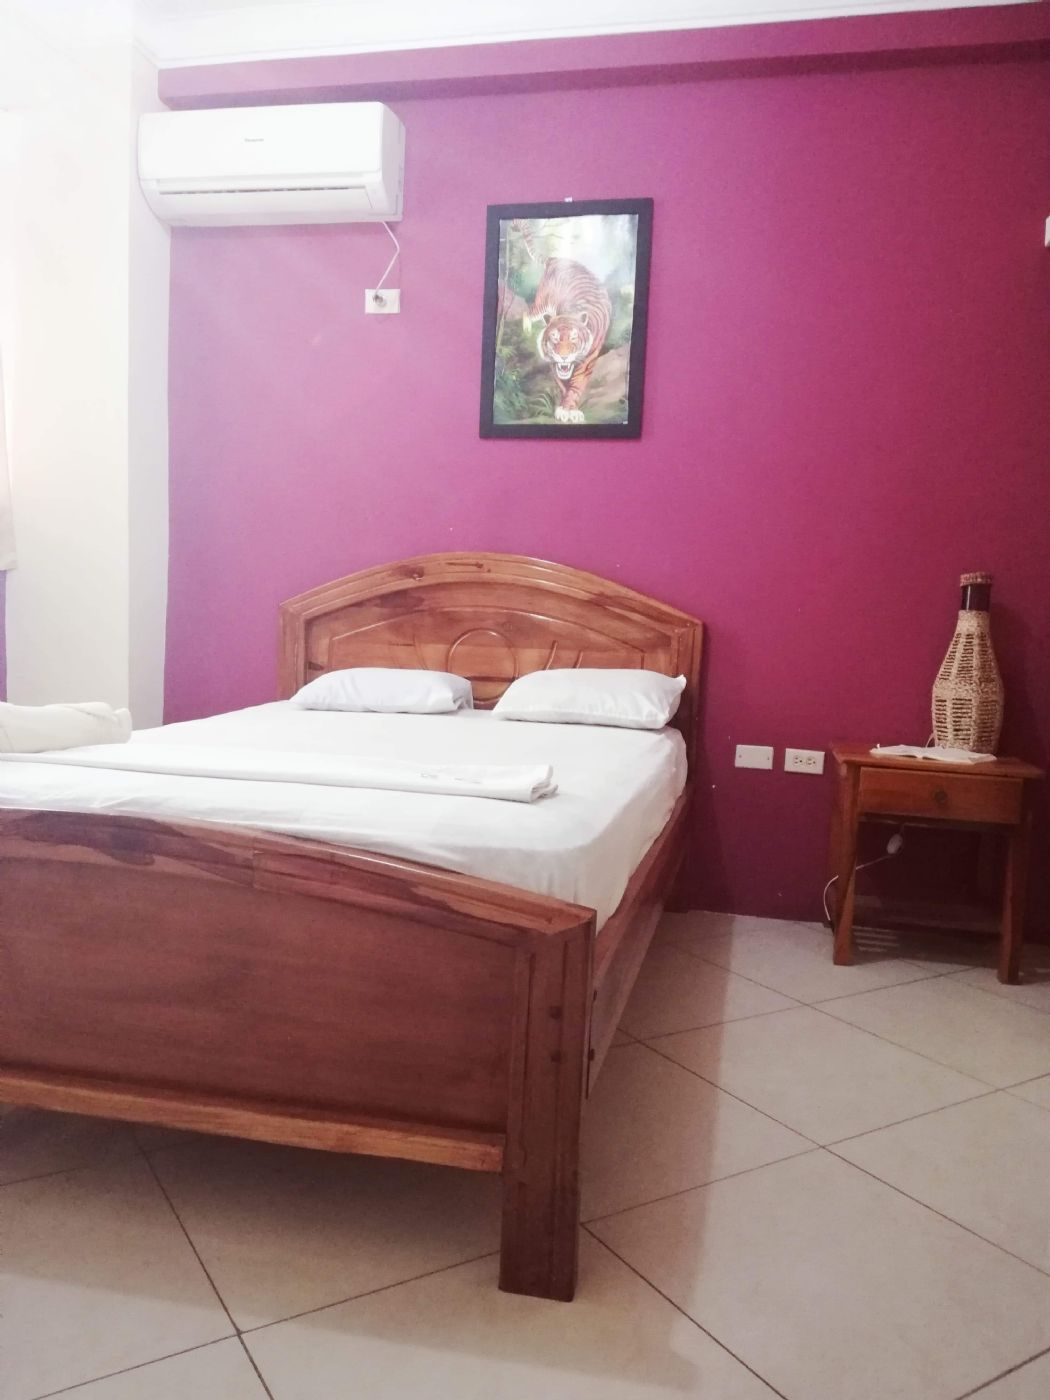 Salinas-Ecuador-property-555496-11.jpg